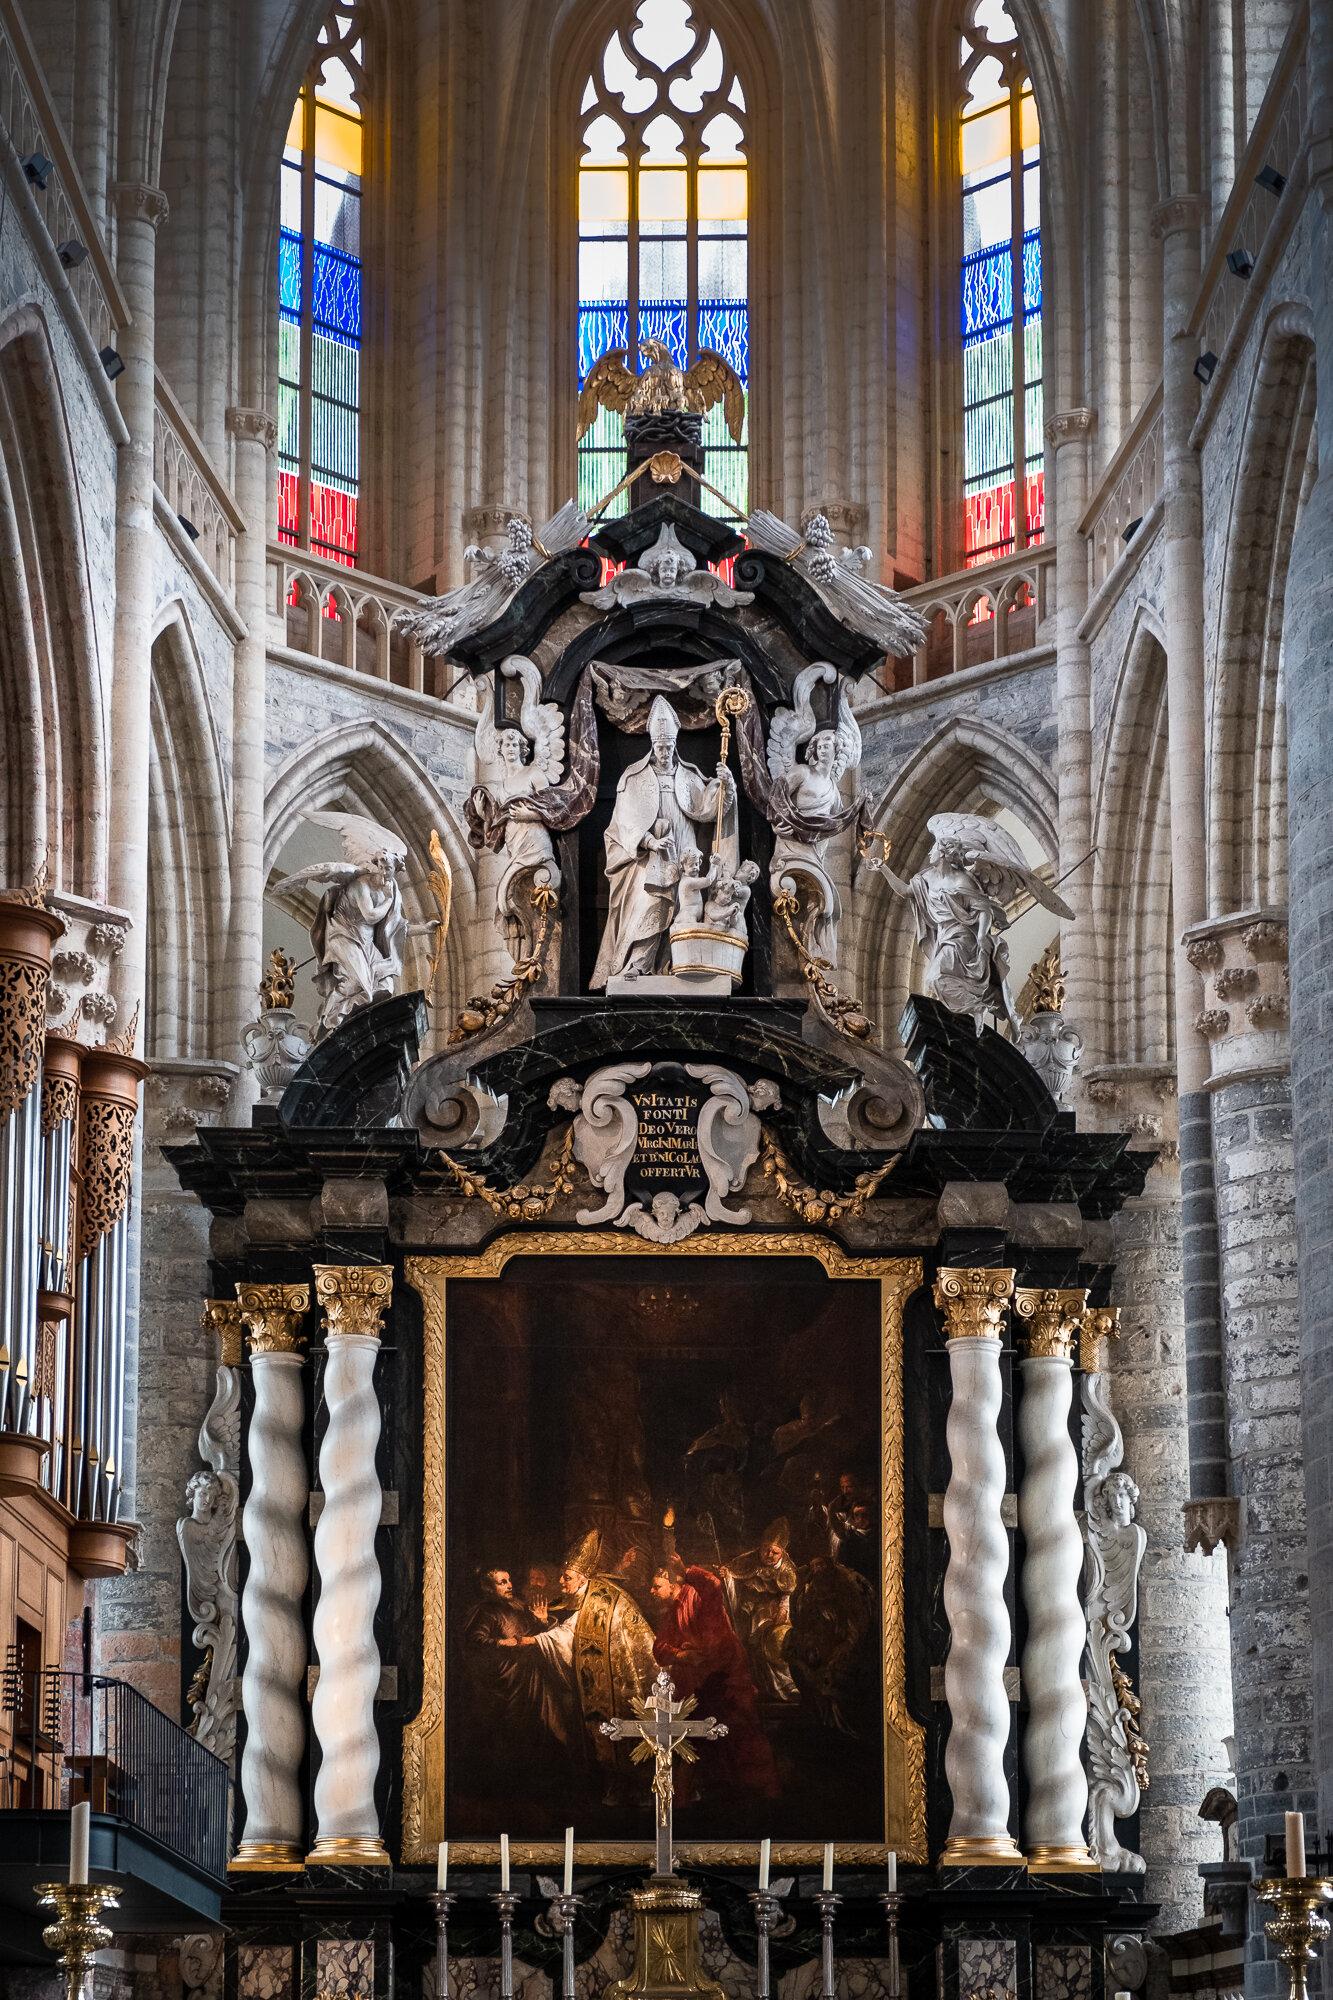 The beautiful interior of St. Nicholas' Church